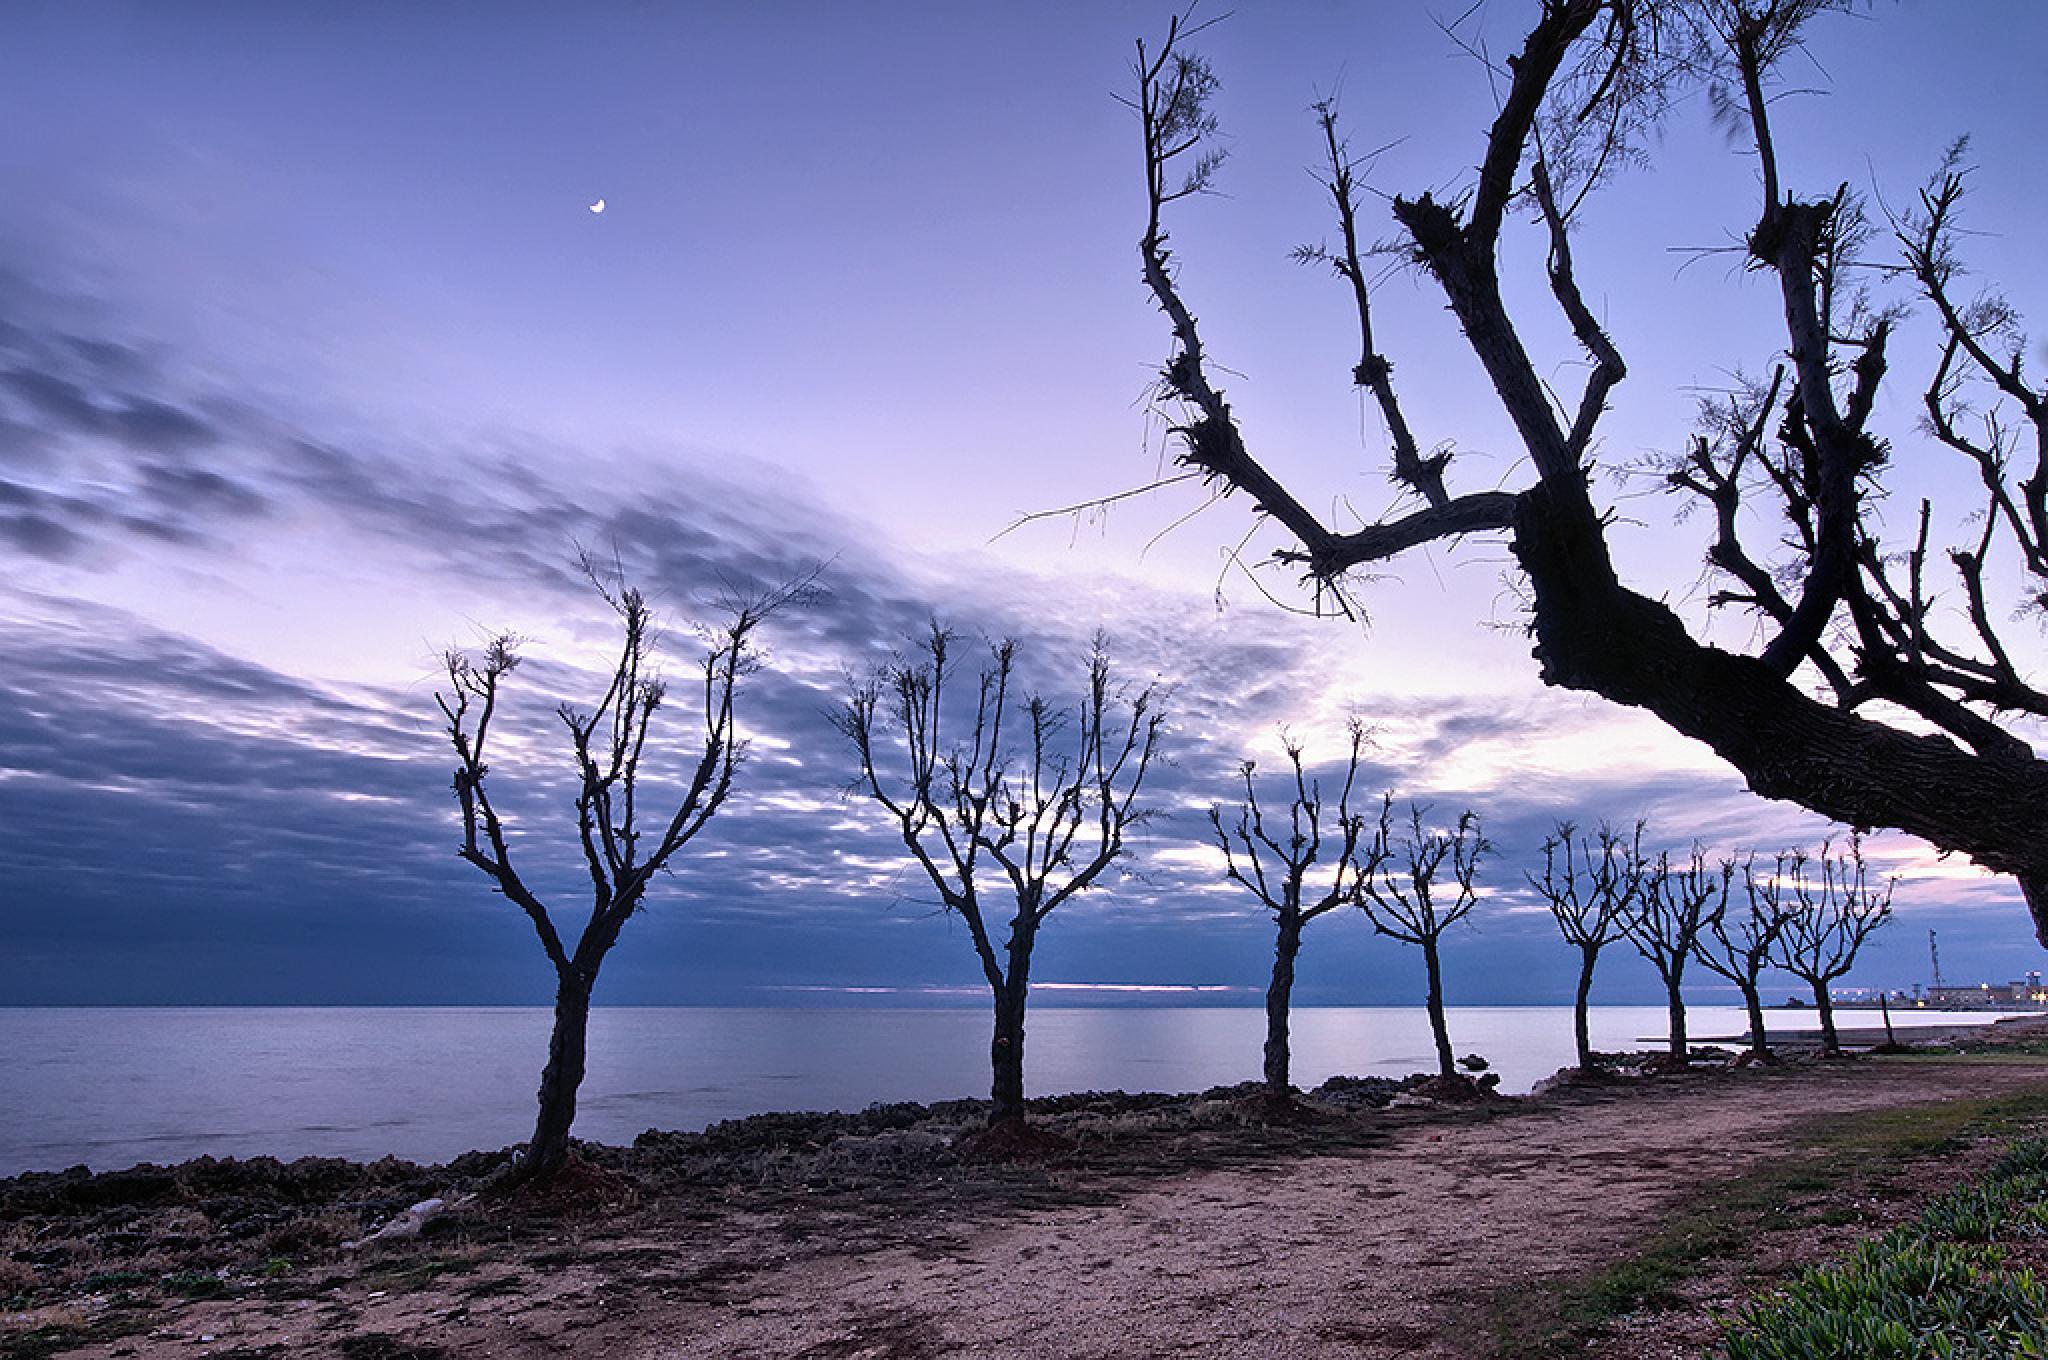 Winter Sea by luigichiriaco